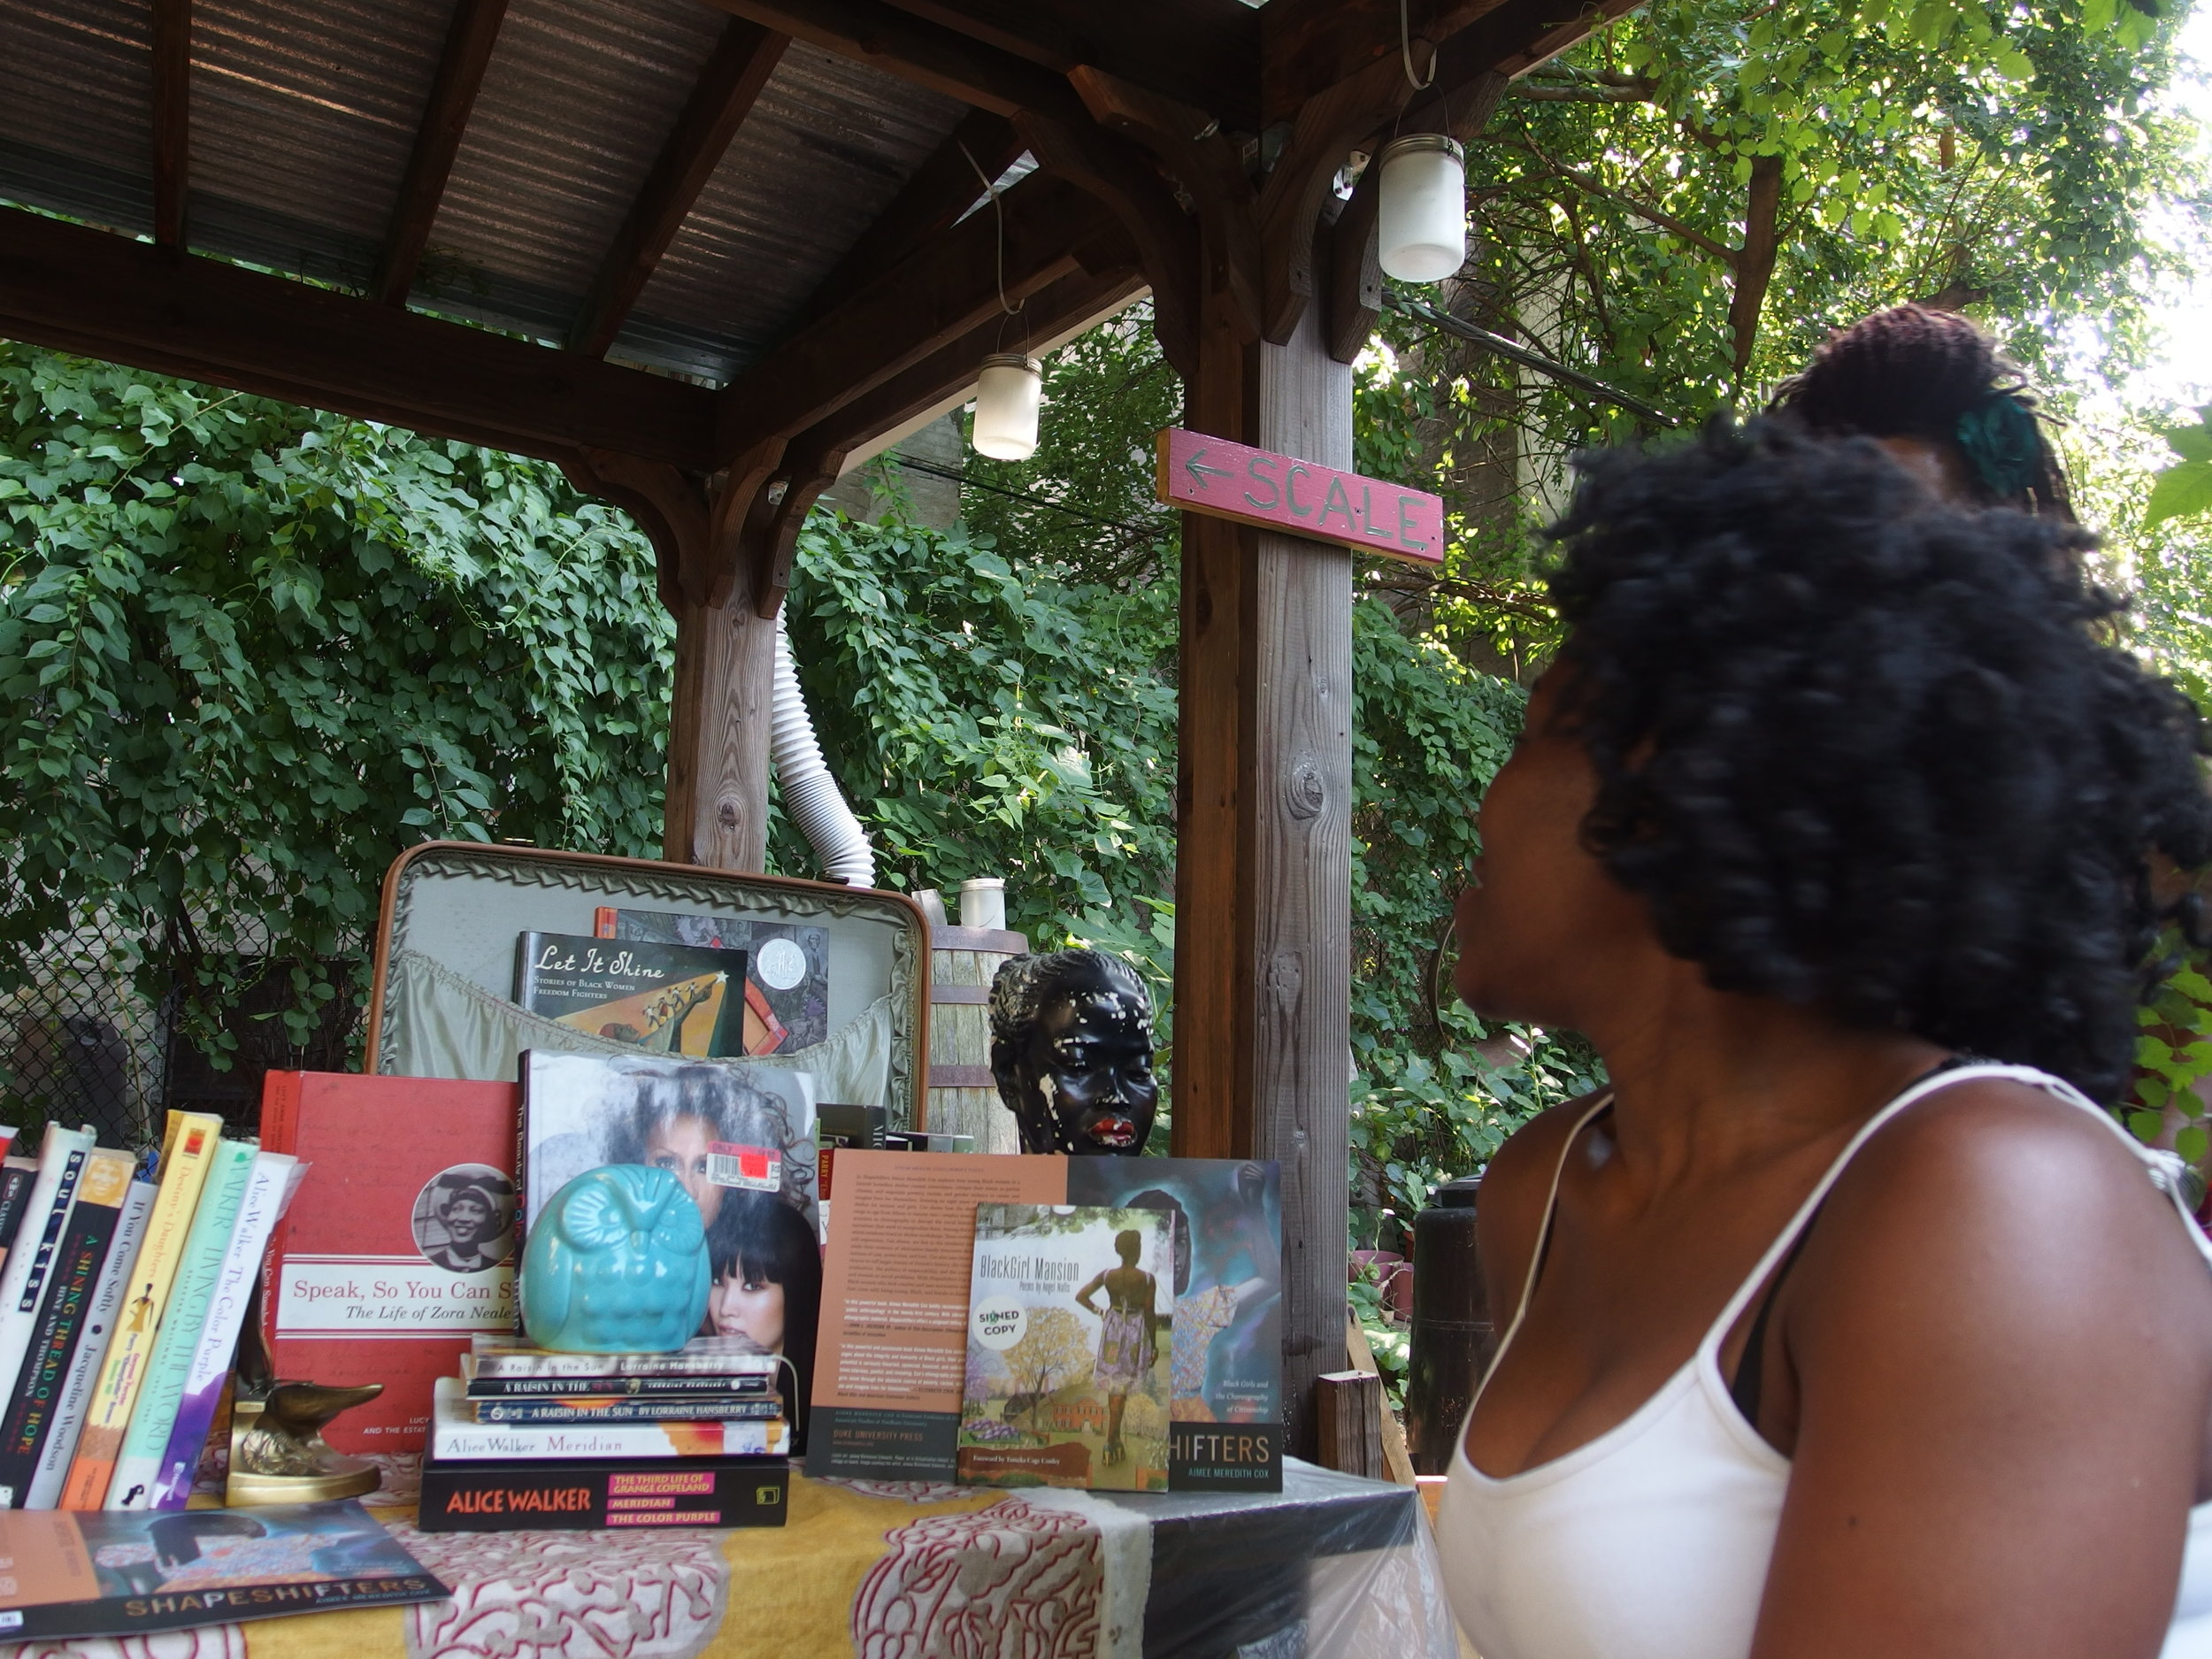 little-free-black-womens-library_20951204155_o.jpg